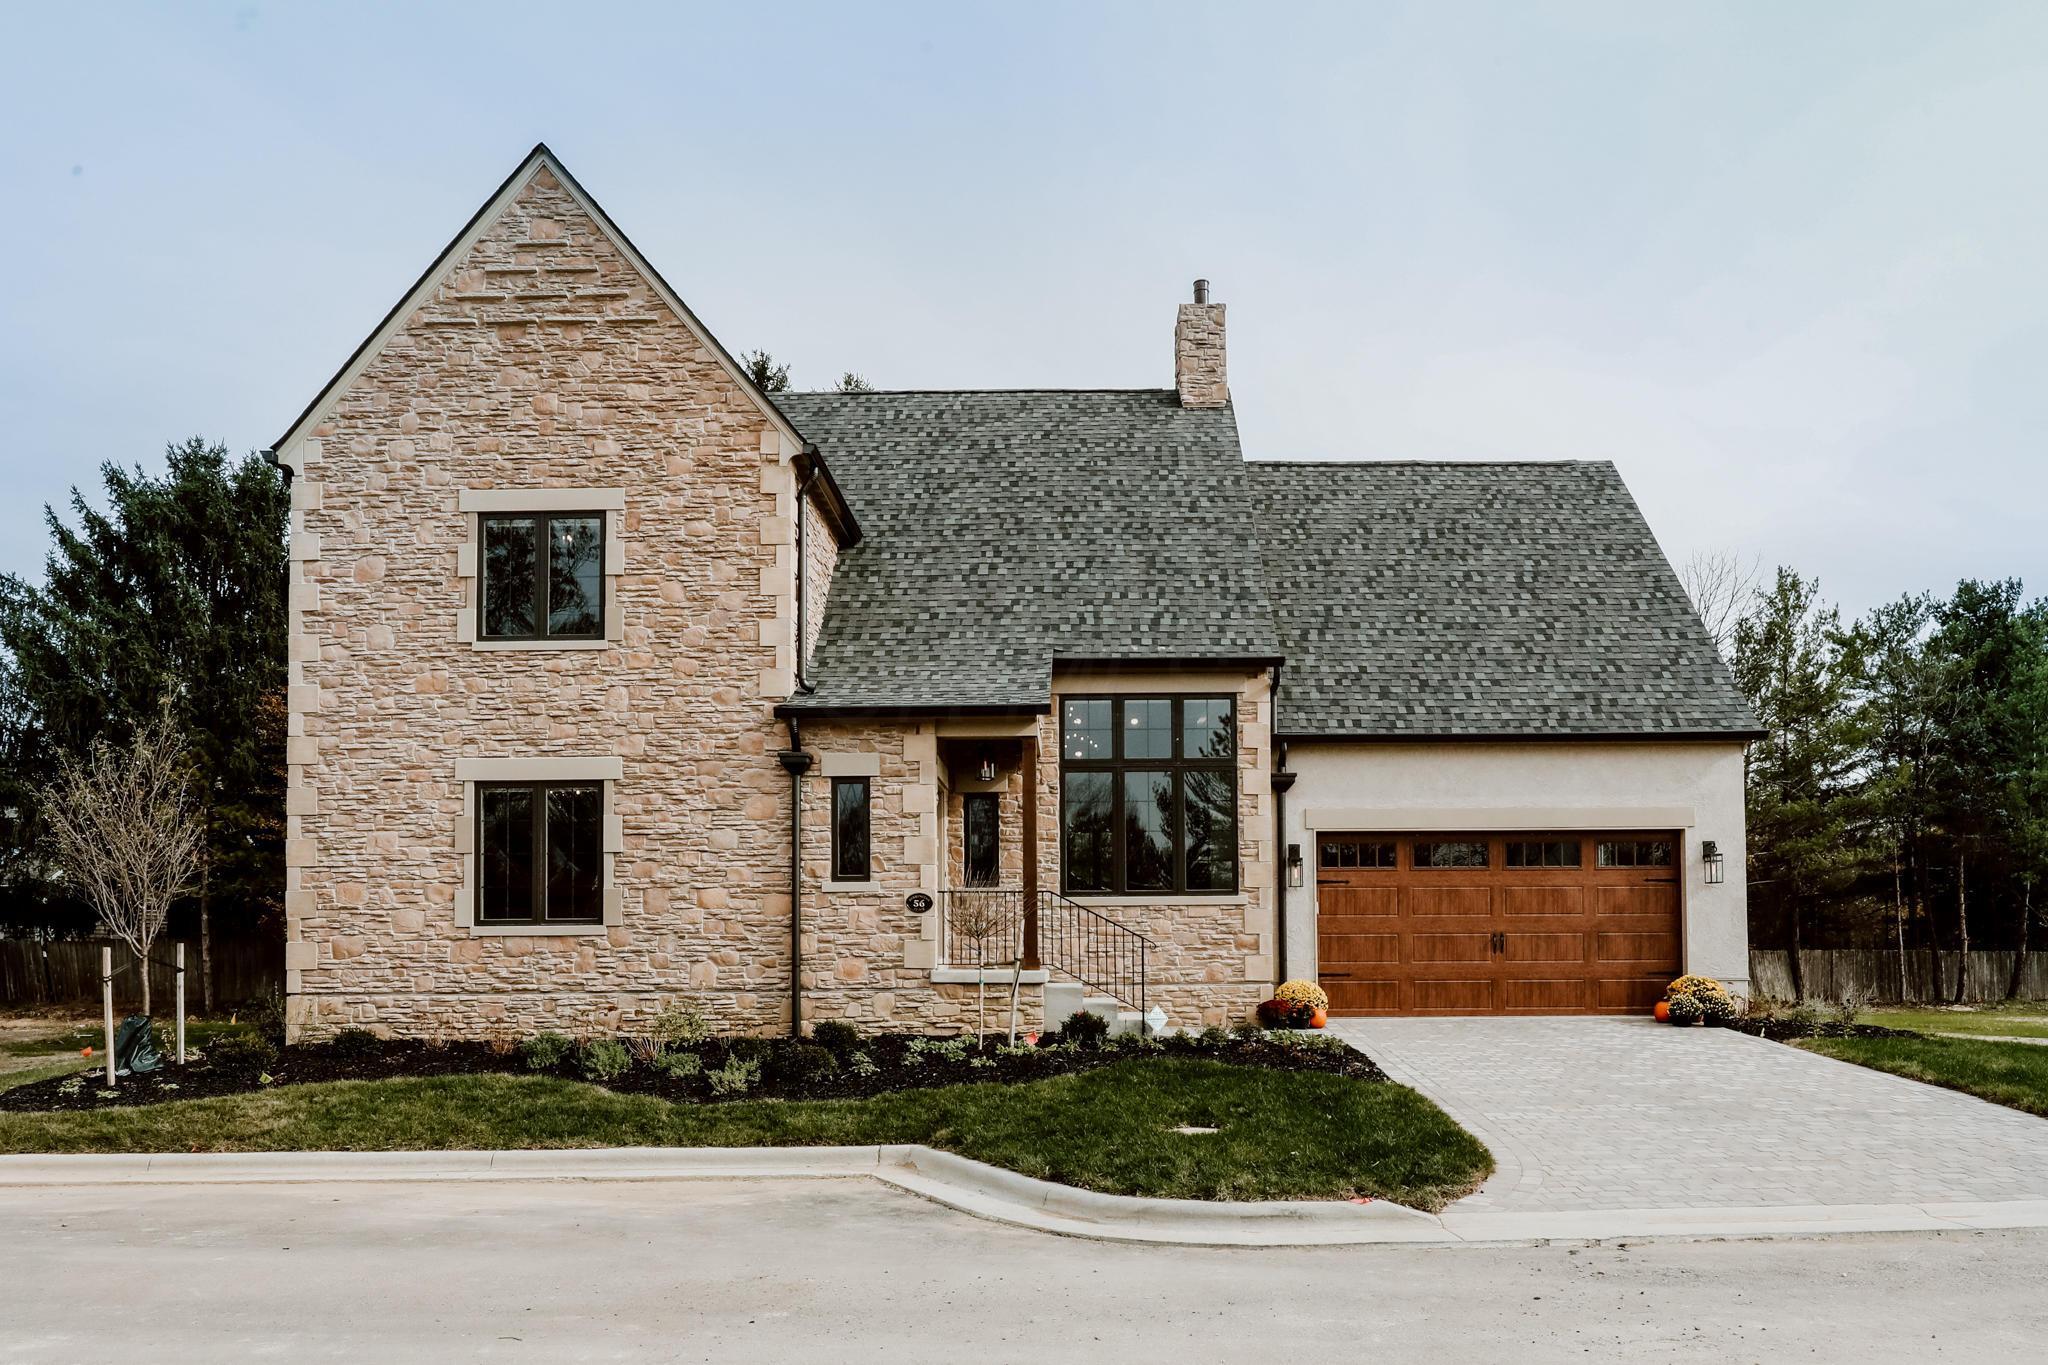 56 Barrington Place, Powell, Ohio 43065, 3 Bedrooms Bedrooms, ,4 BathroomsBathrooms,Residential,For Sale,Barrington,220039467